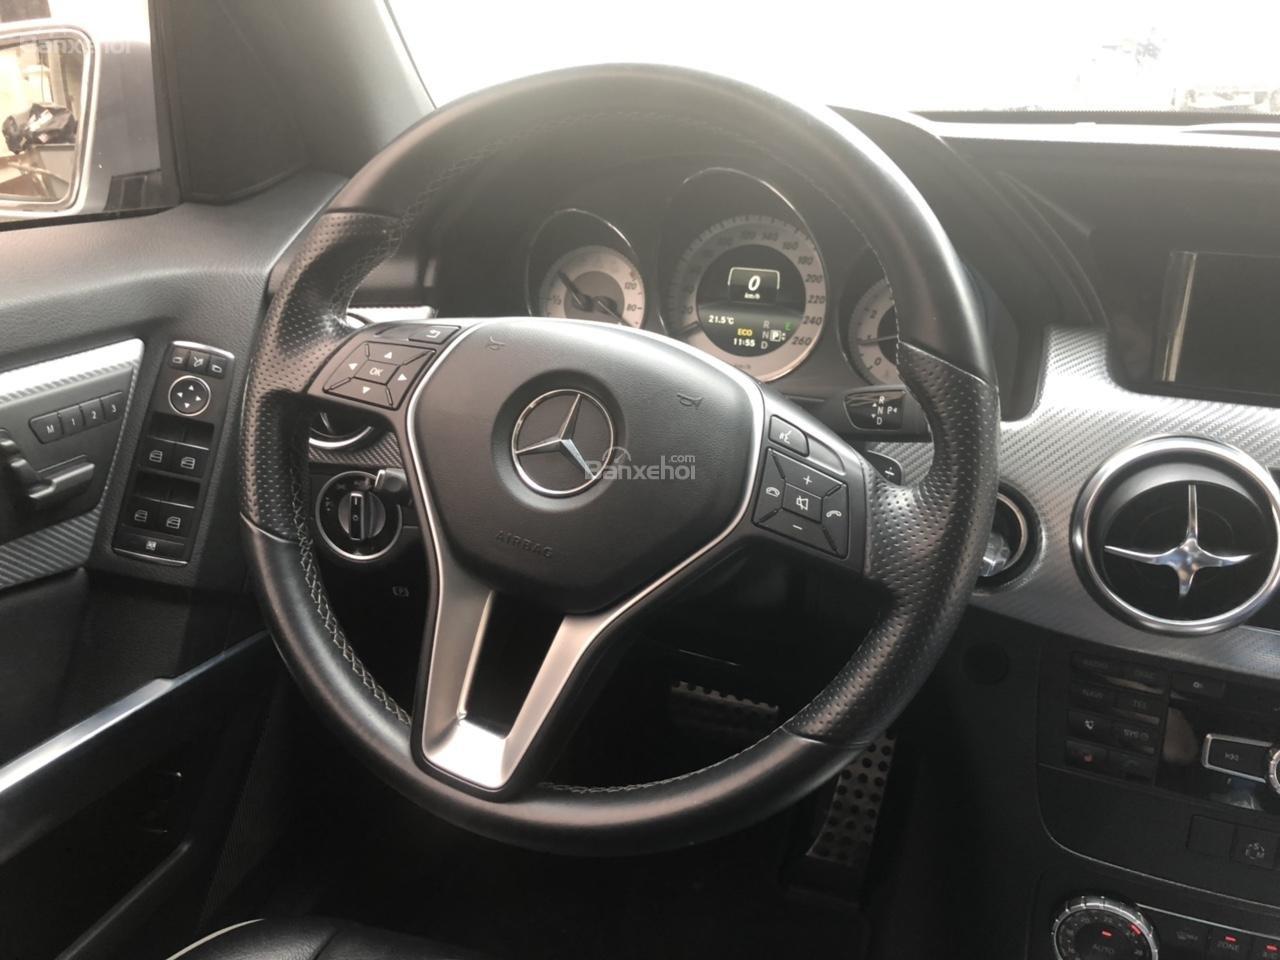 Cần bán xe Mercedes GLK Class năm sản xuất 2013-3